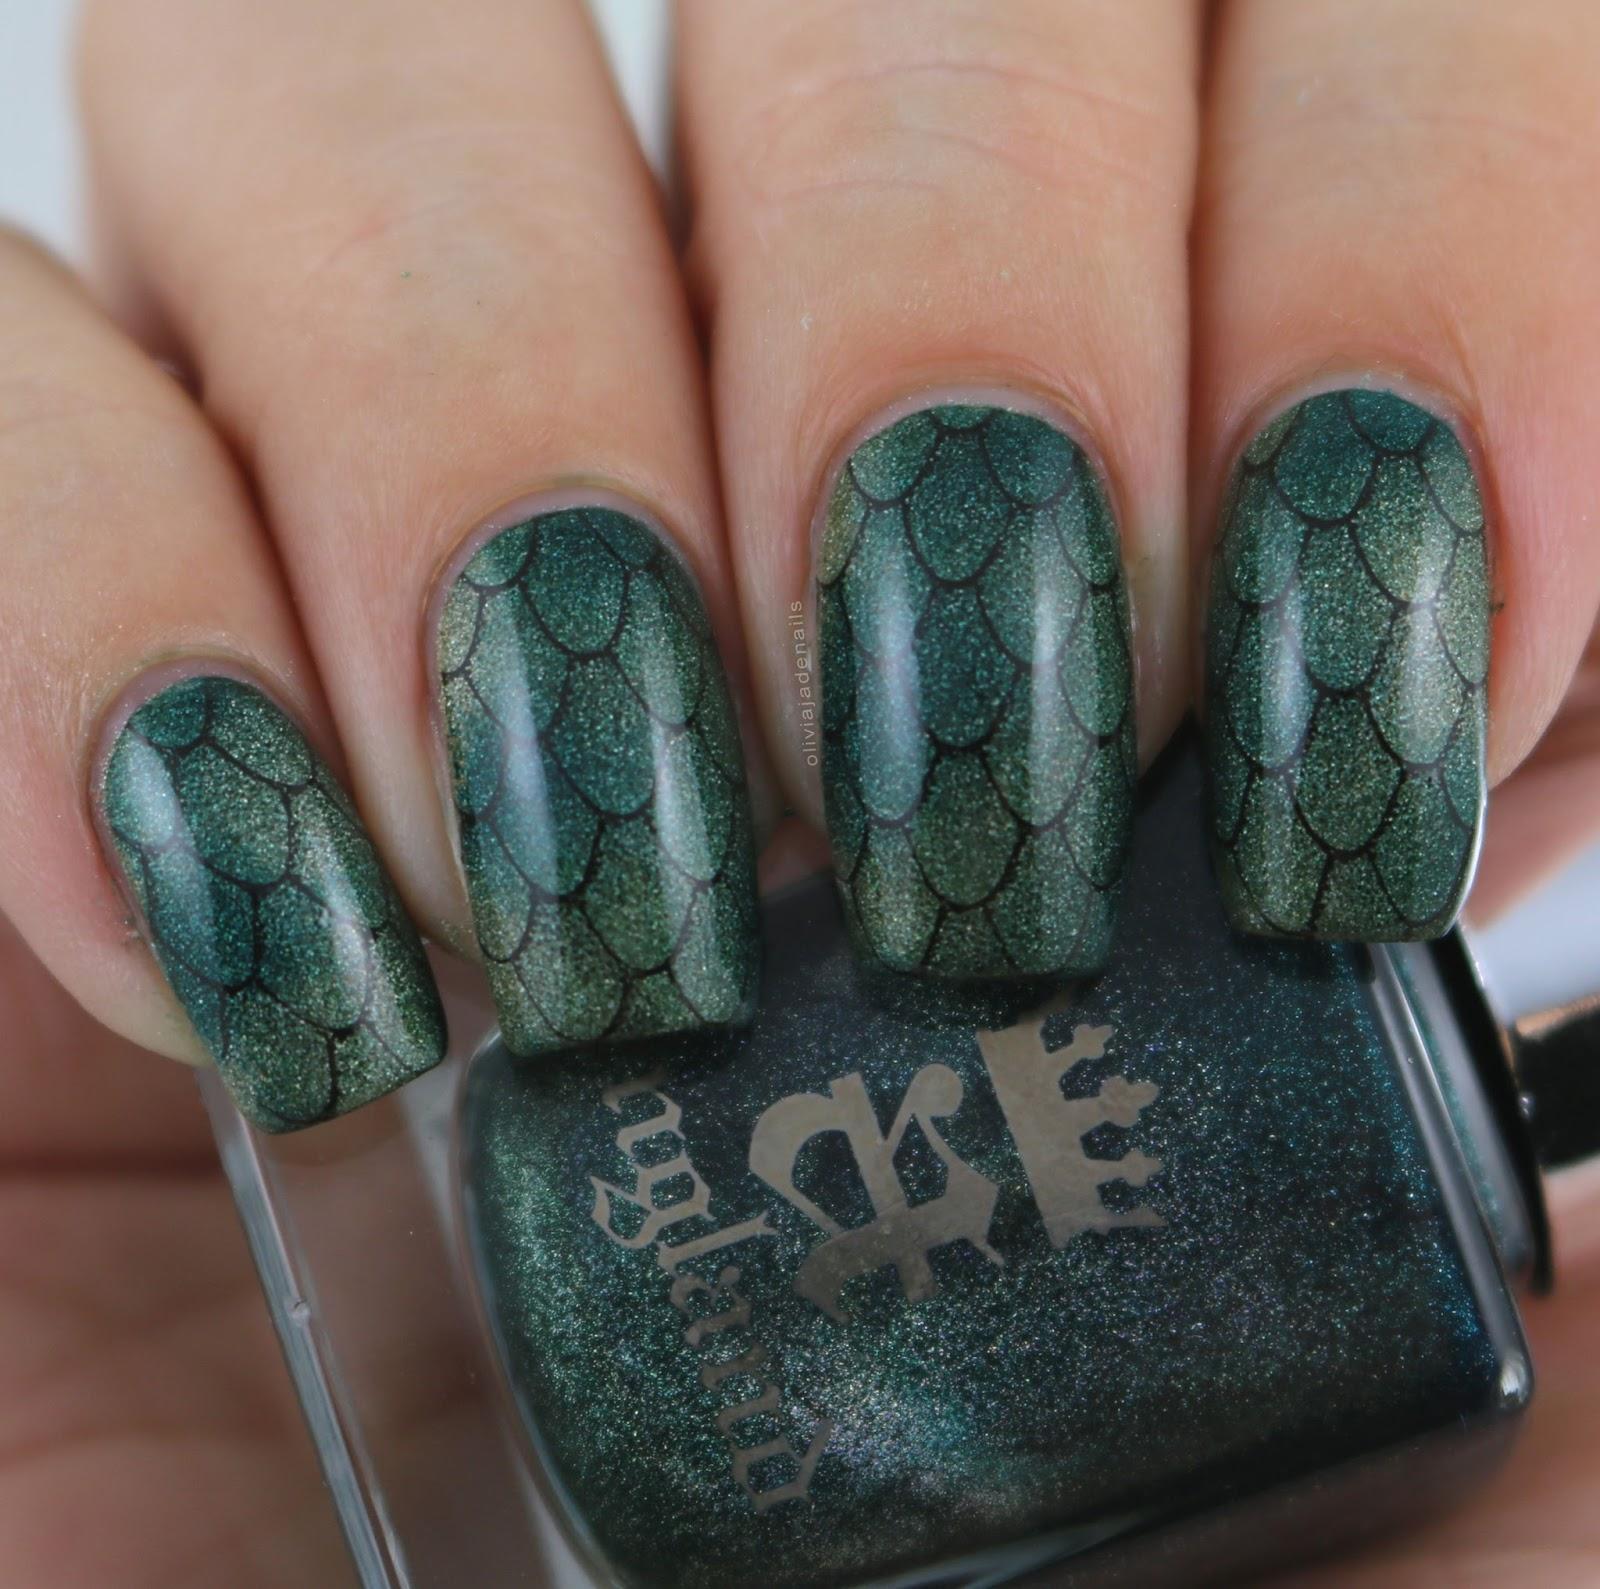 Colorful Jades Nails Gift - Nail Paint Ideas - microskincareinc.us